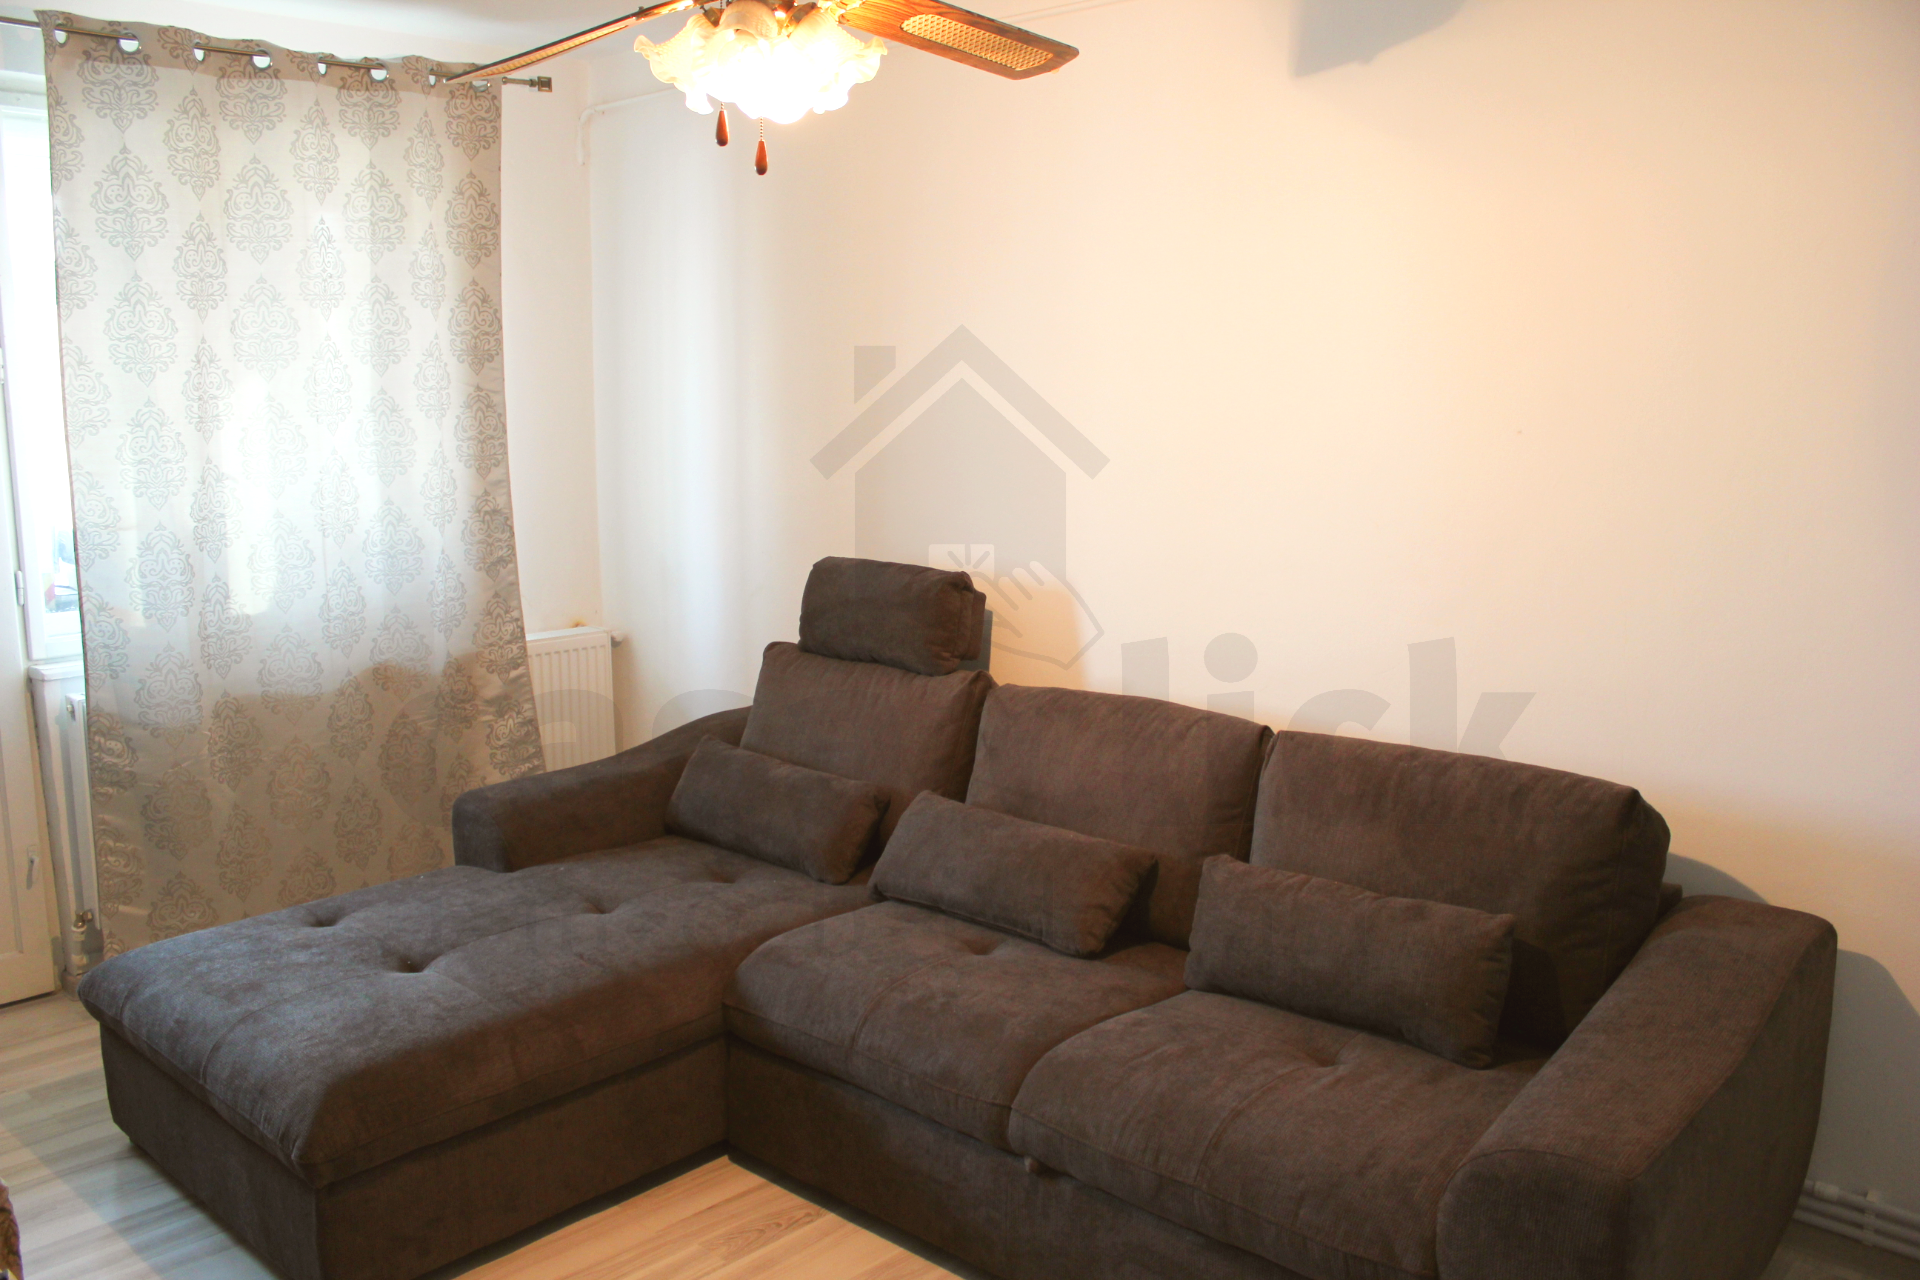 Apartament Piata Centrala: 3 camere, dotari moderne, zona excelenta